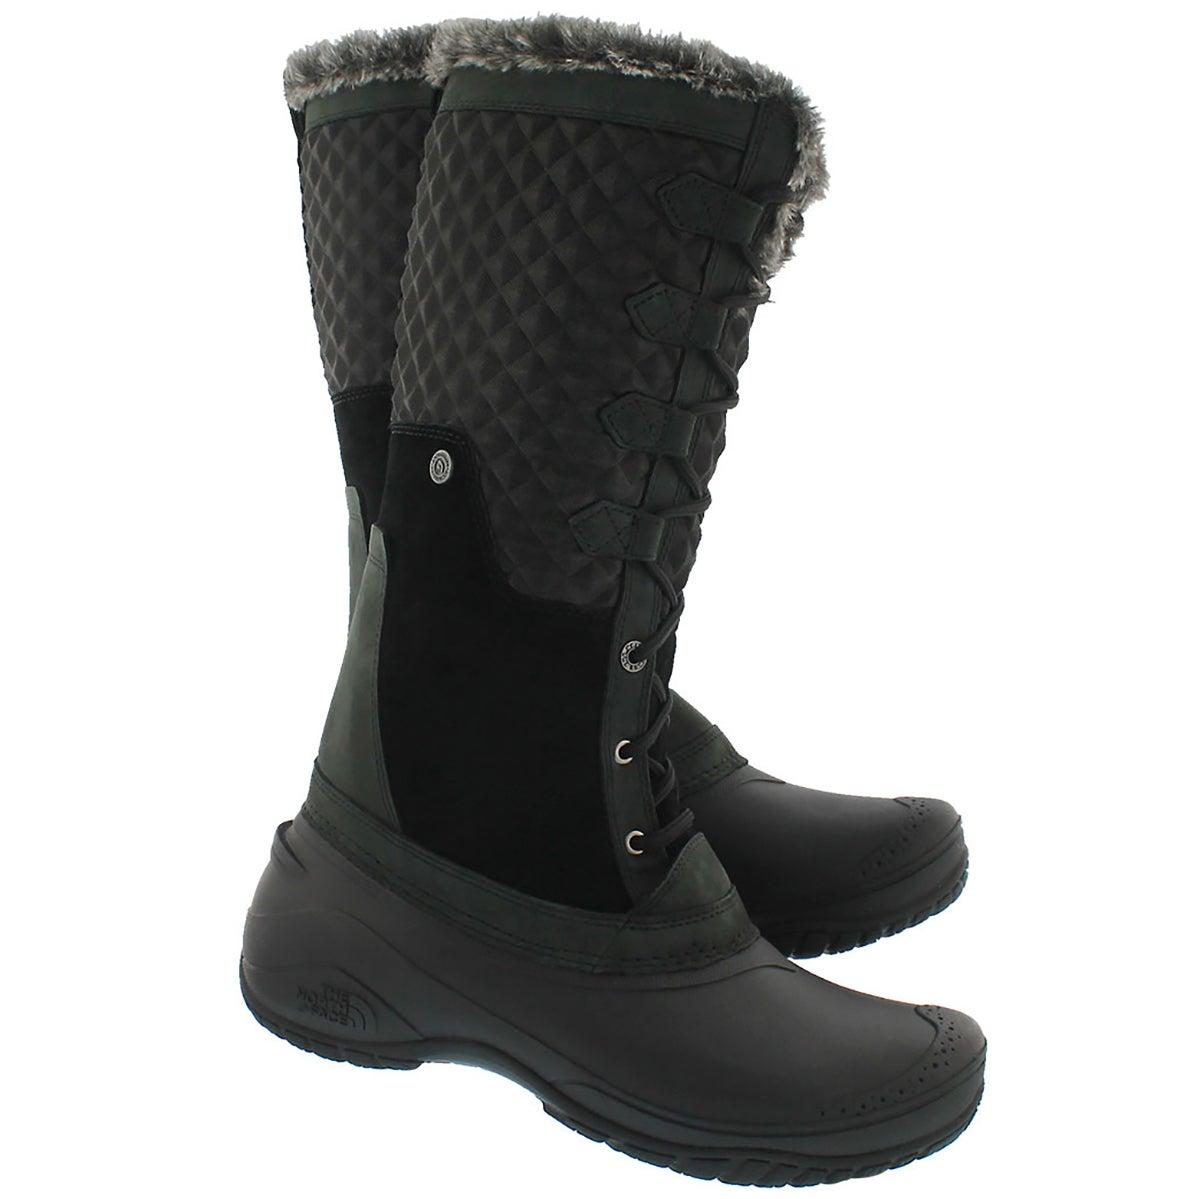 Lds Shellista III Tall black wntr boot